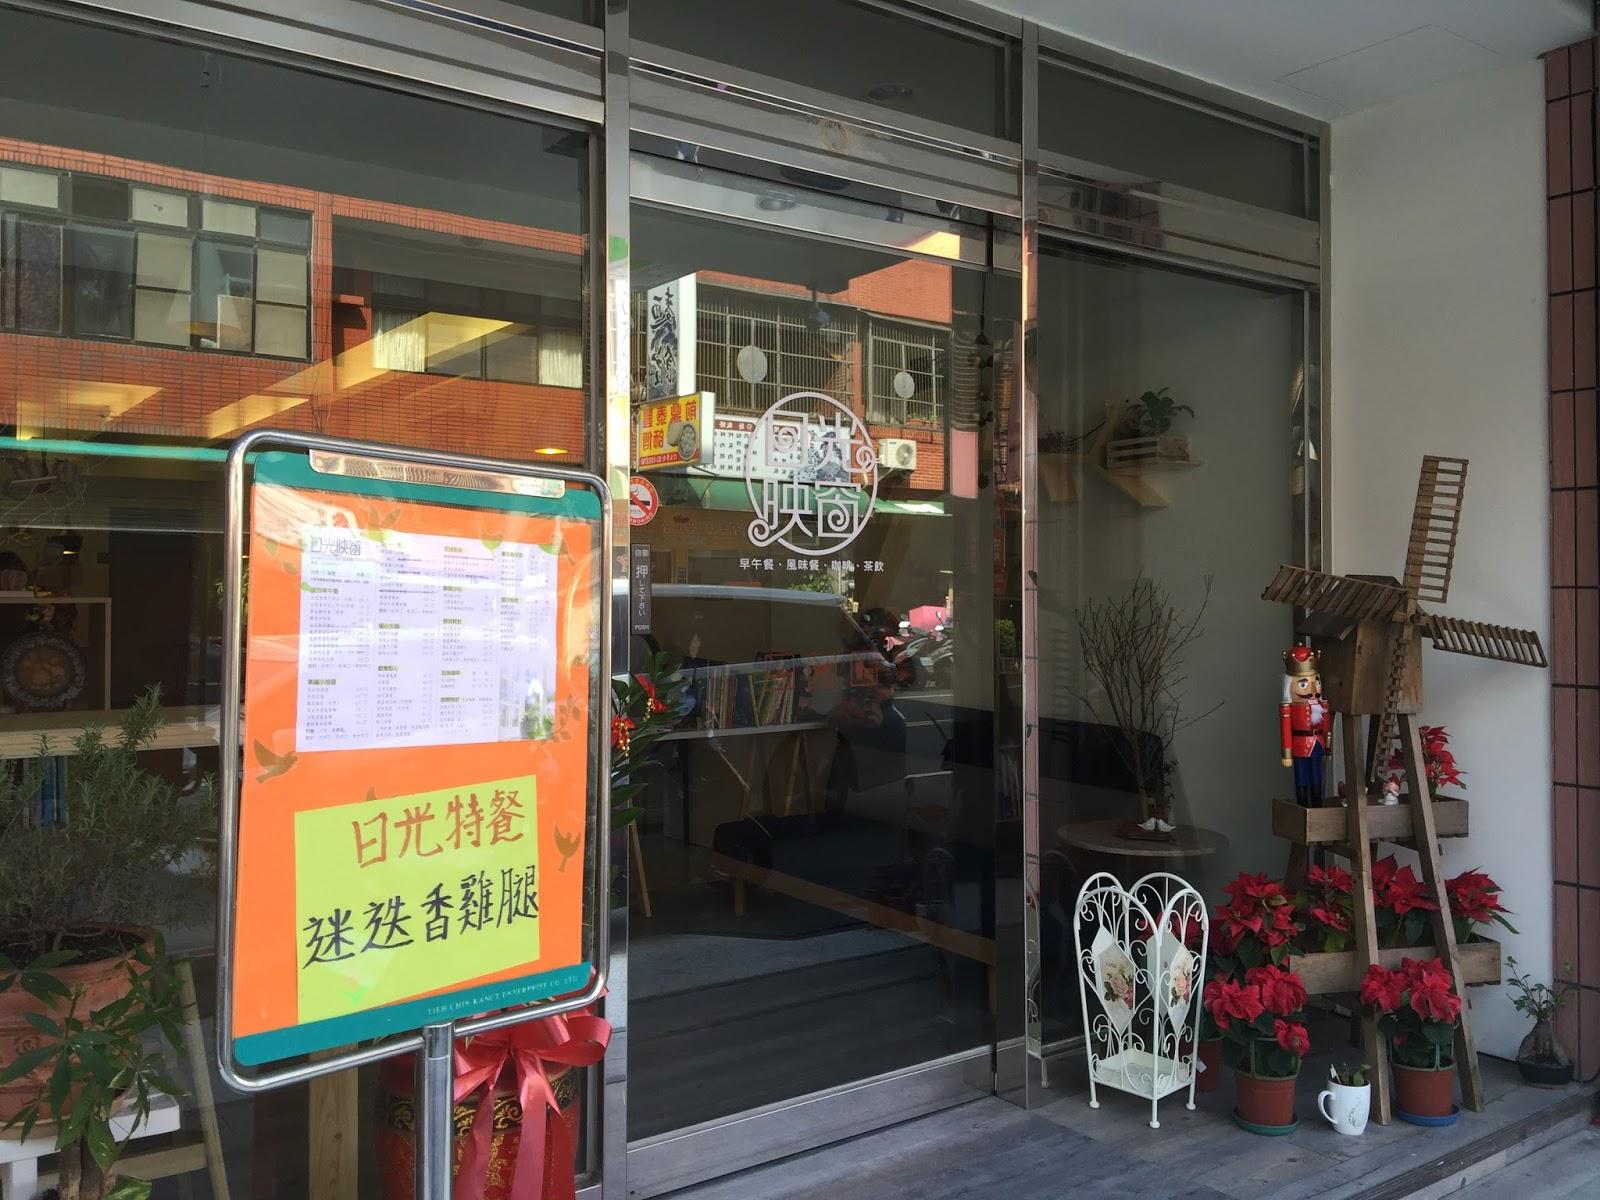 We Are Friends 。樂。活。: 竹北 日光映窗 Cafe - brunch 輕食 簡餐